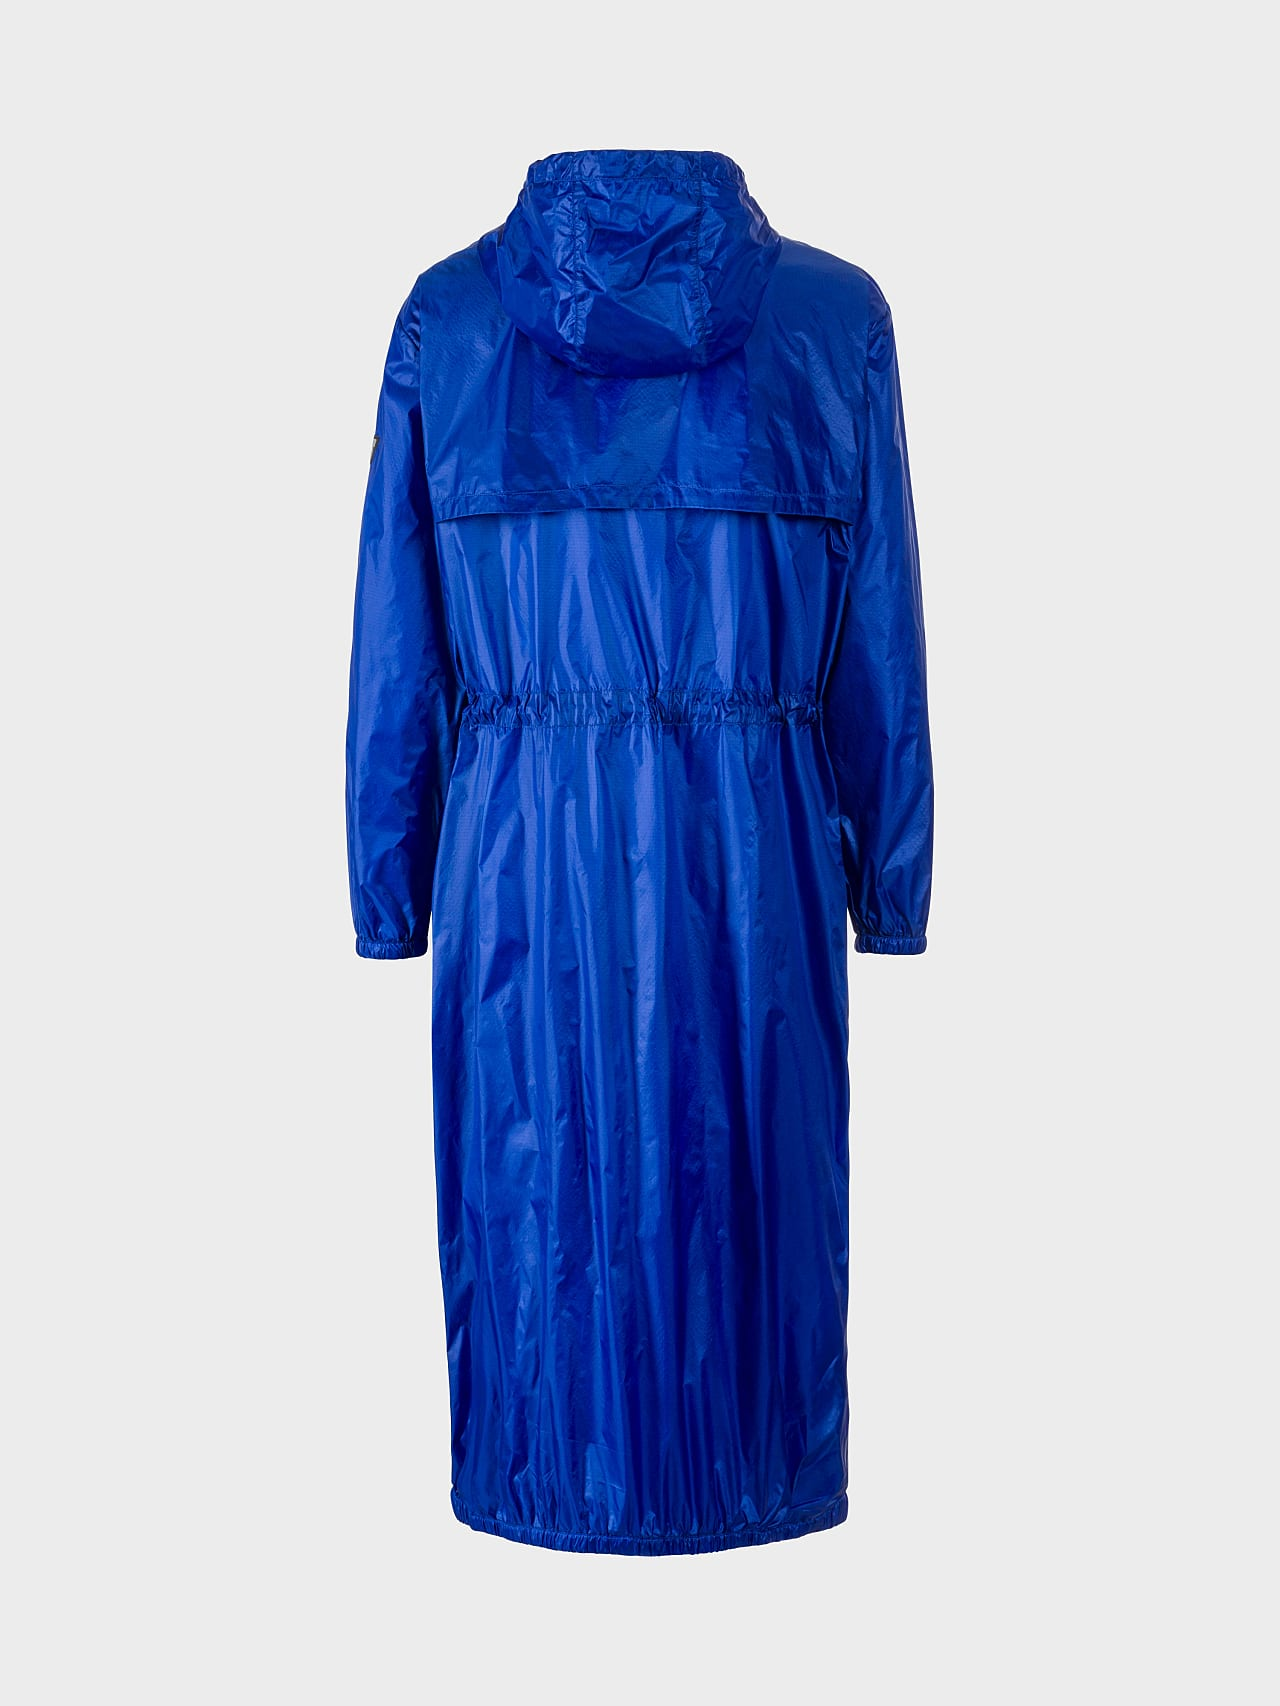 OLONO V2.Y5.01 Packable Windbreaker Coat blue Left Alpha Tauri